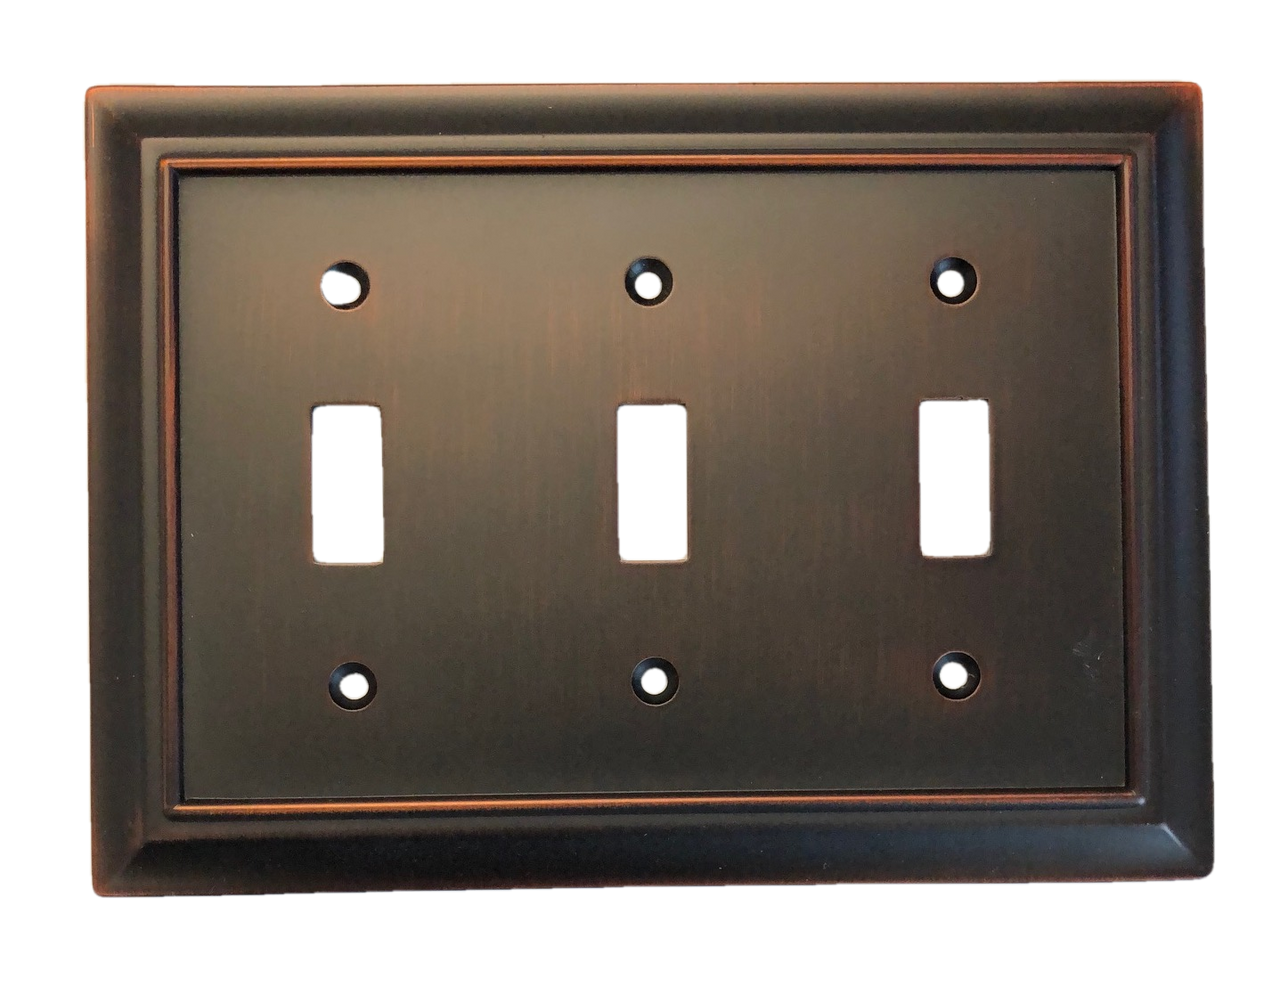 Brainerd W10599-BZM Architect Matte Bronze Triple Switch Wall Plate Cover